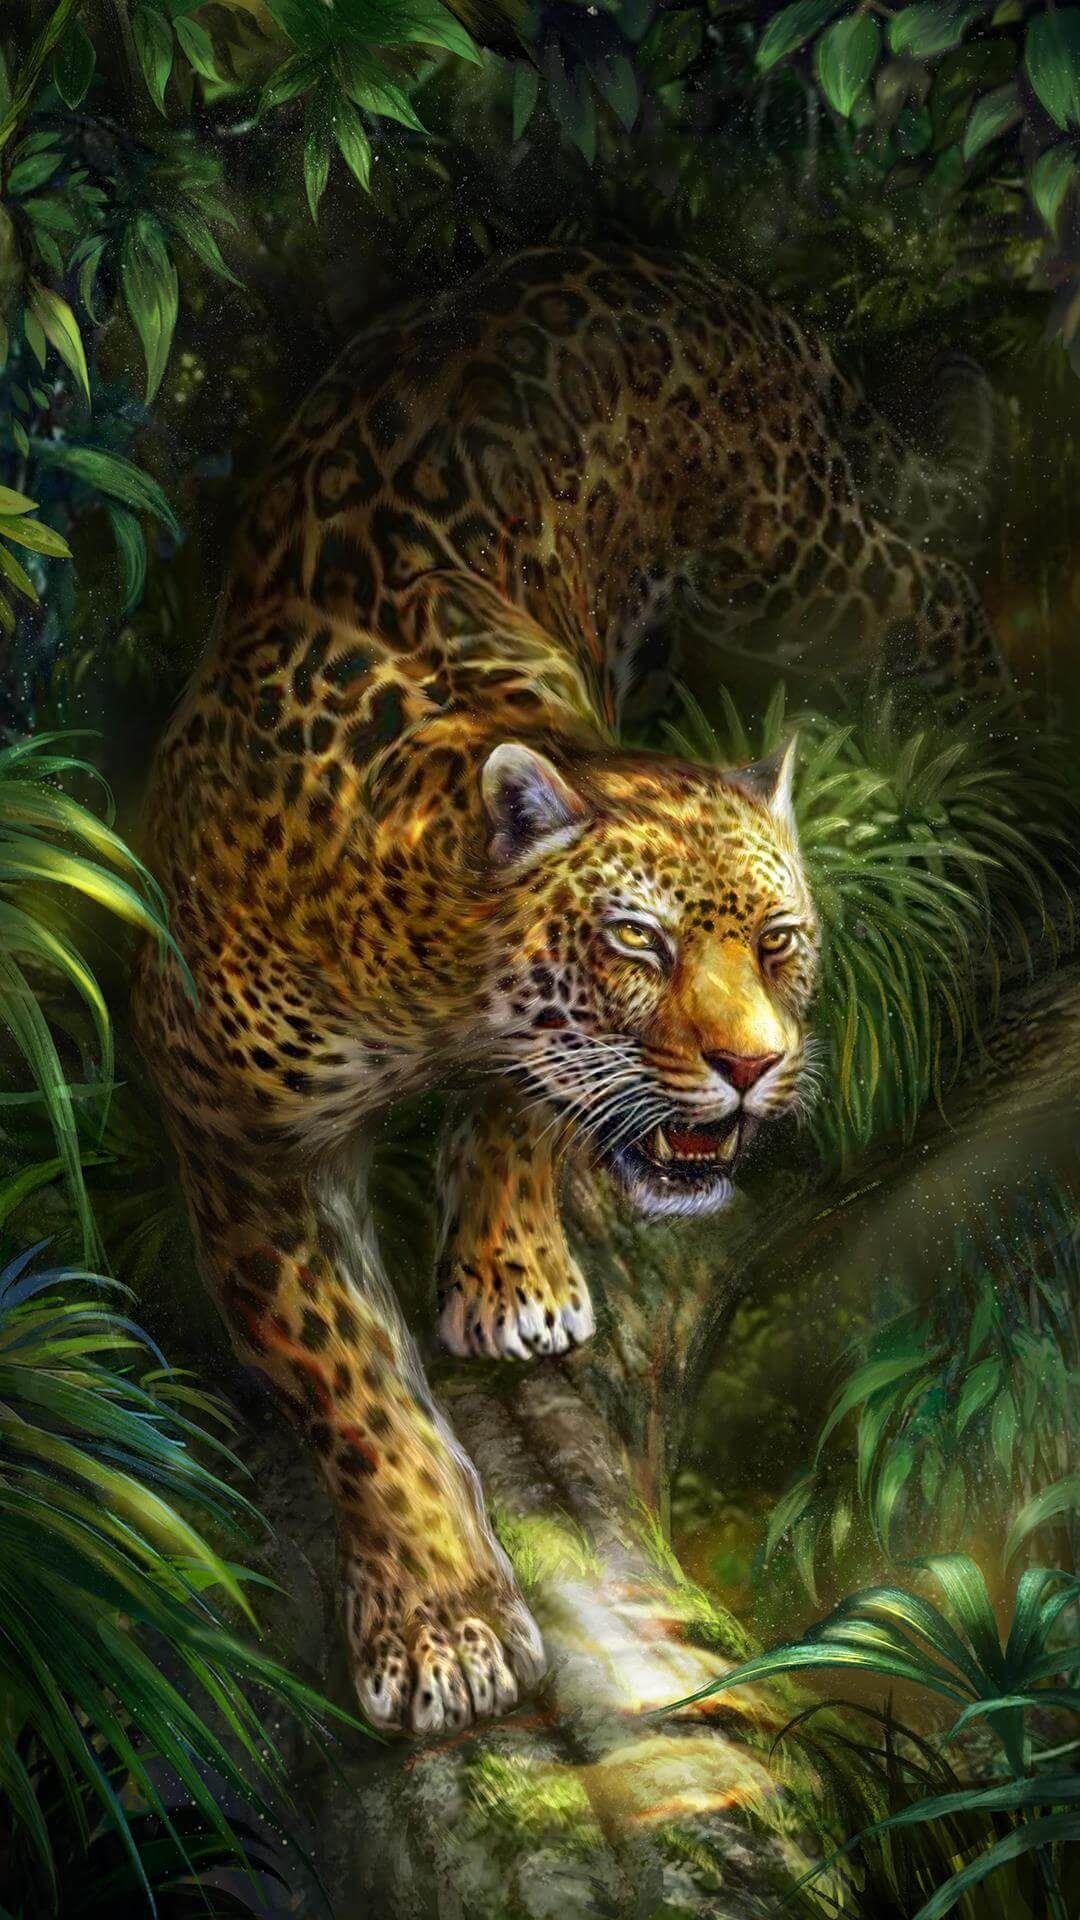 Slinky leopard in the forest! Live wallpaper! Jaguar